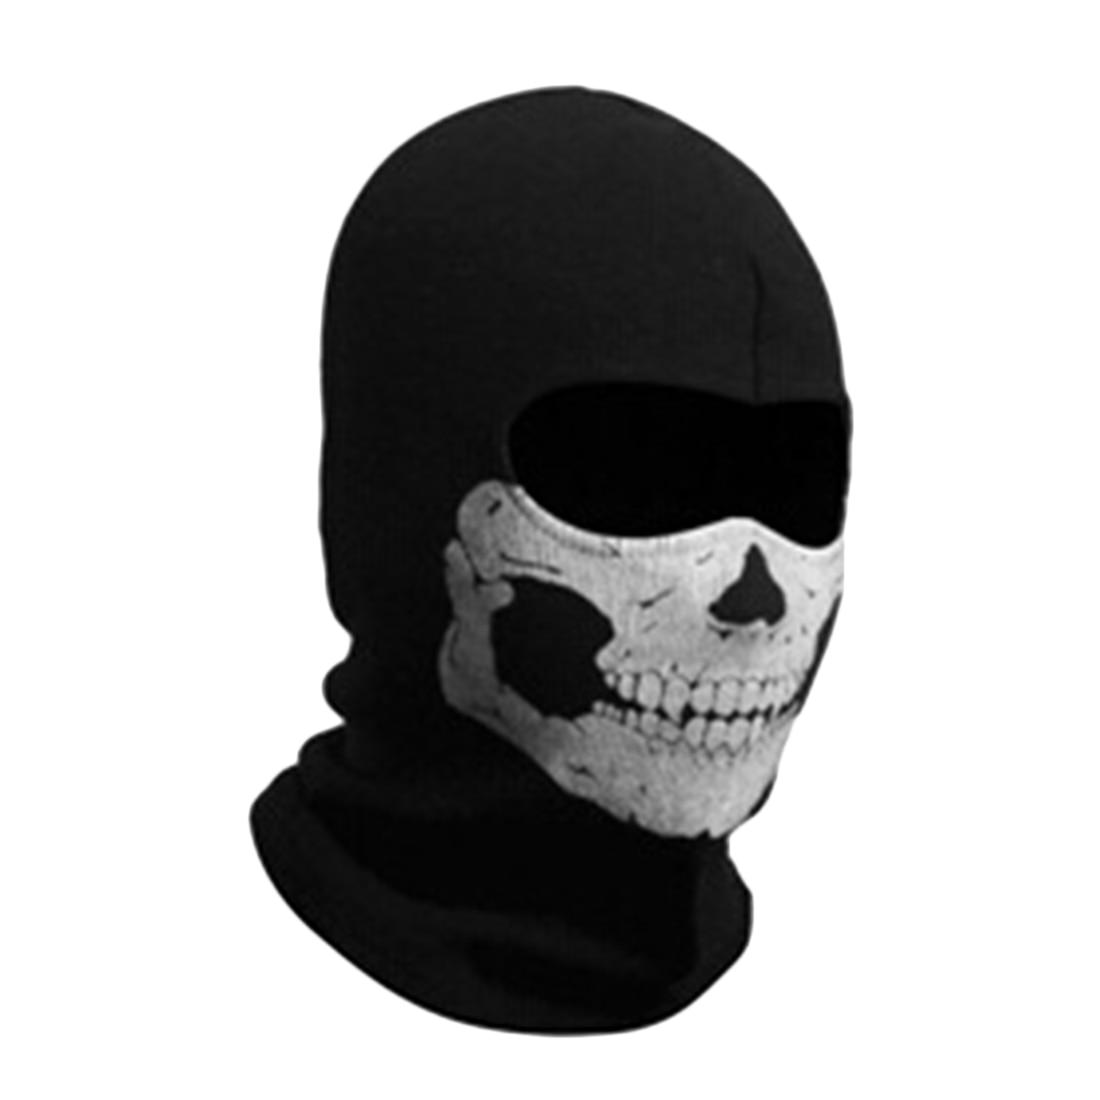 Full face mask neck warmer hood balaclava outdoor winter sports hats - Face Neck Warmer